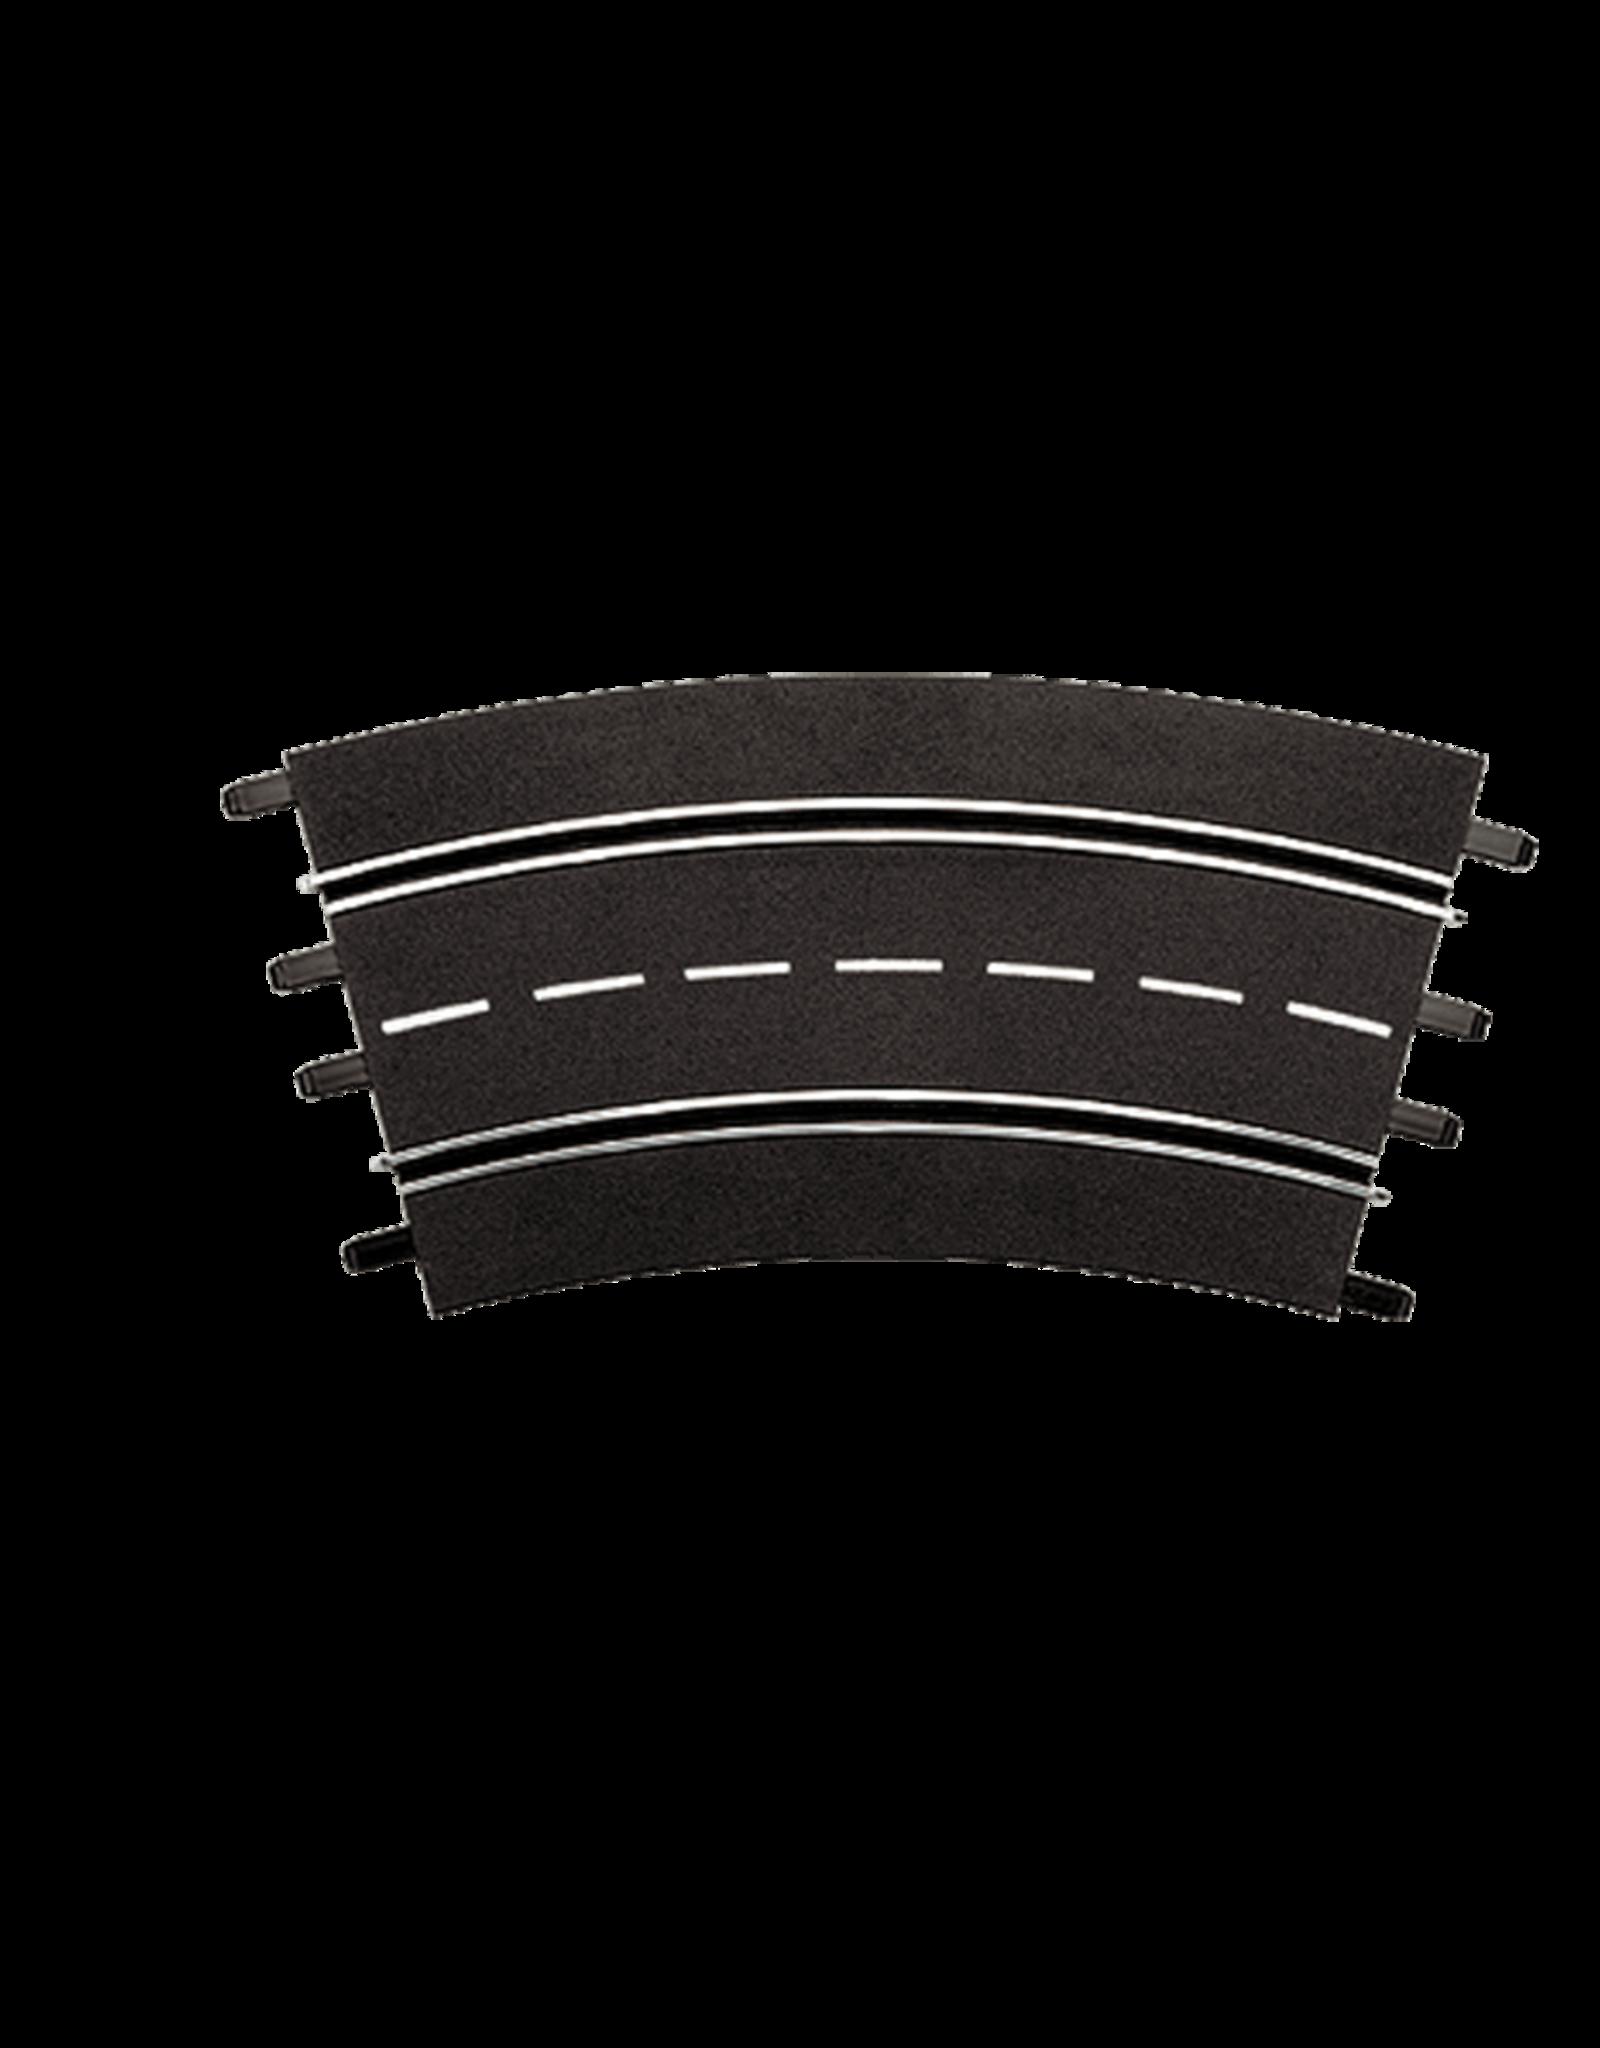 carrera CAR20573 Curve 3/30°, 6 Pieces - Digital 124/132 & Analog